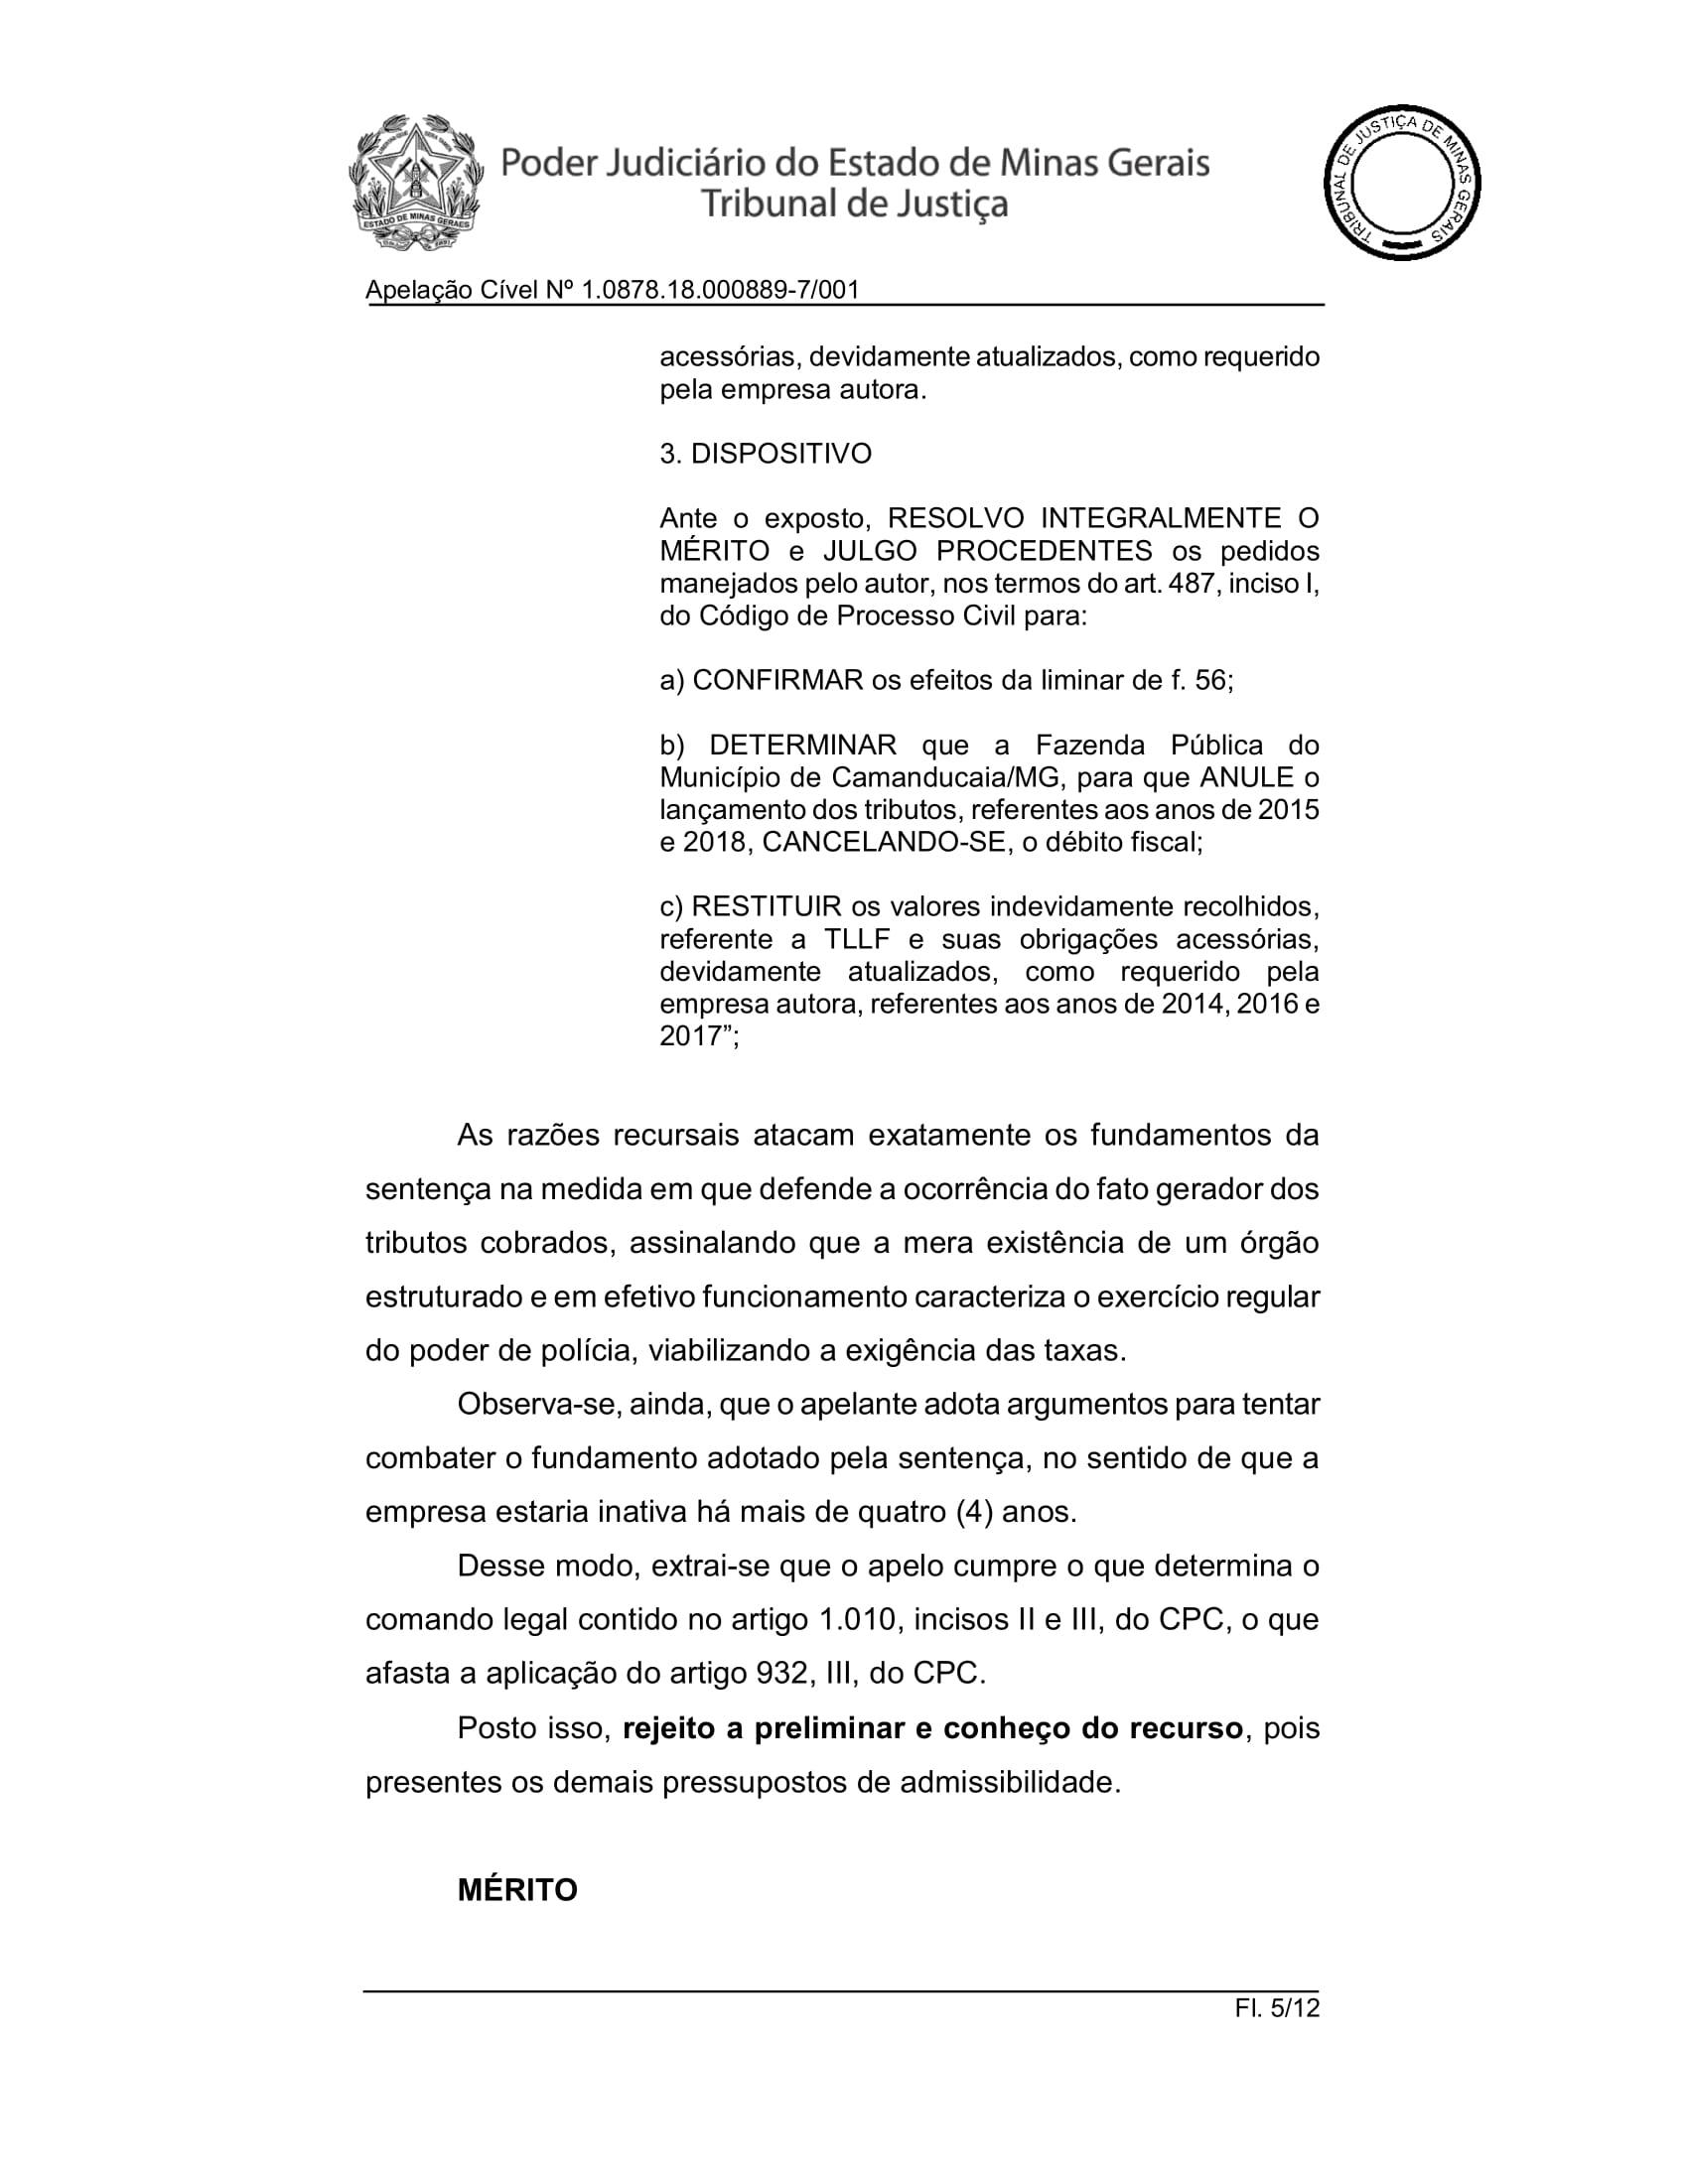 empresa-inativa-nao-pagar-taxa-05